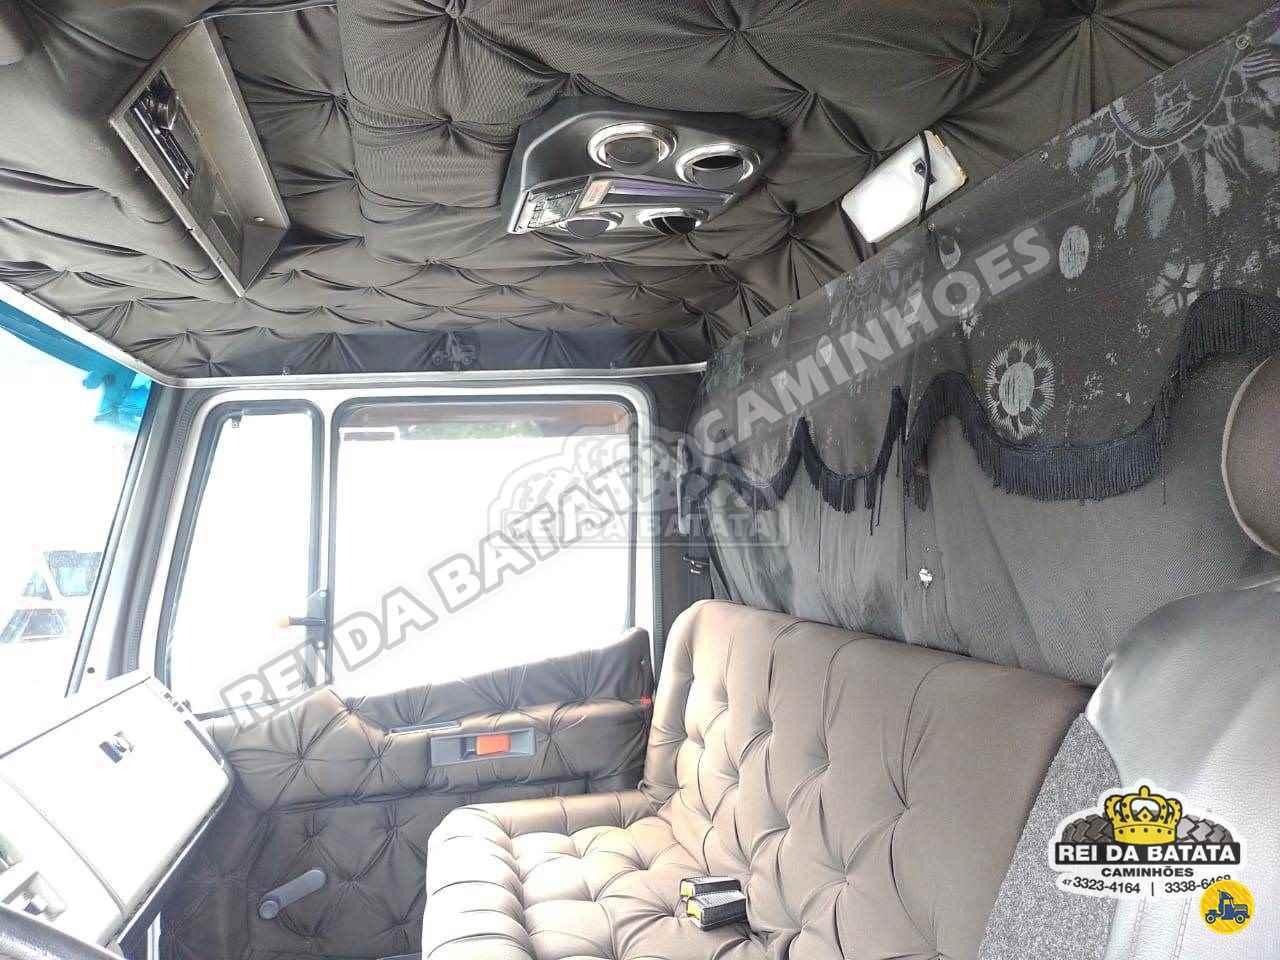 MERCEDES-BENZ MB 1218 104000km 1996/1996 Rei da Batata Caminhões